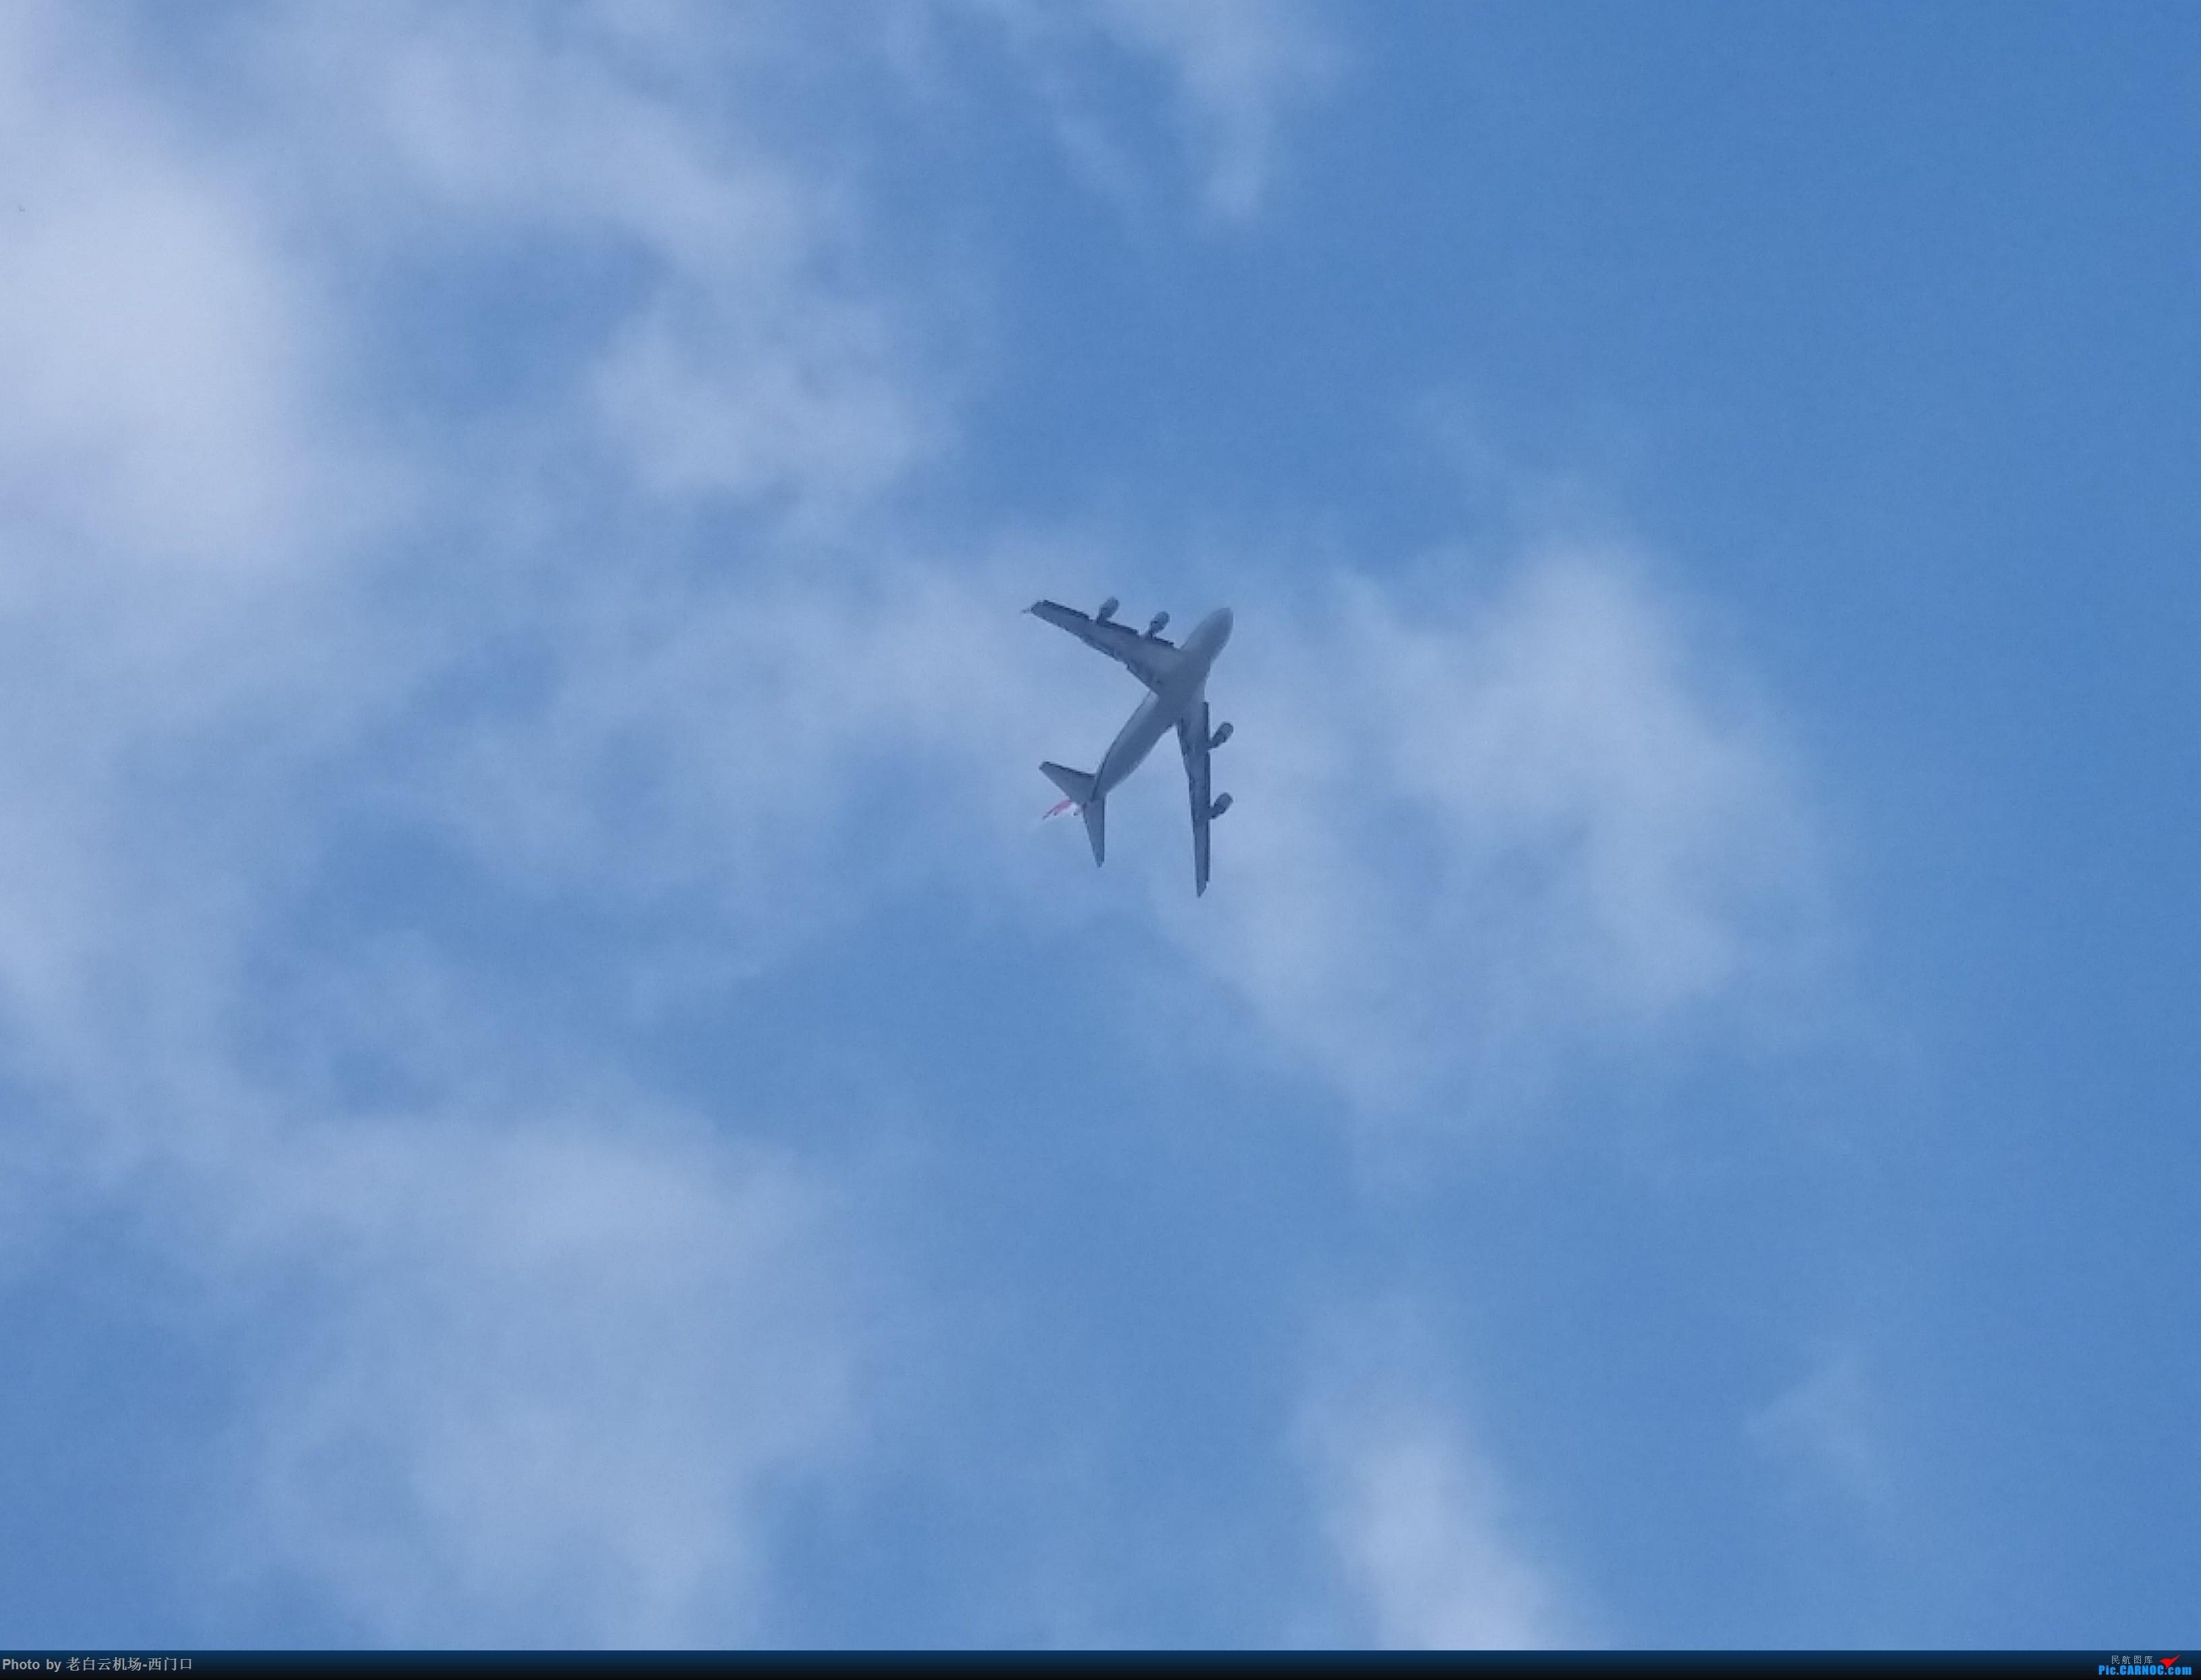 Re:[原创]【梁泽希拍机故事6】2017年第一、第二、第三次拍机和2018年第三次拍机(第二版) BOEING 747-400 不明 中国广东省广州市荔湾区西门口广场上空